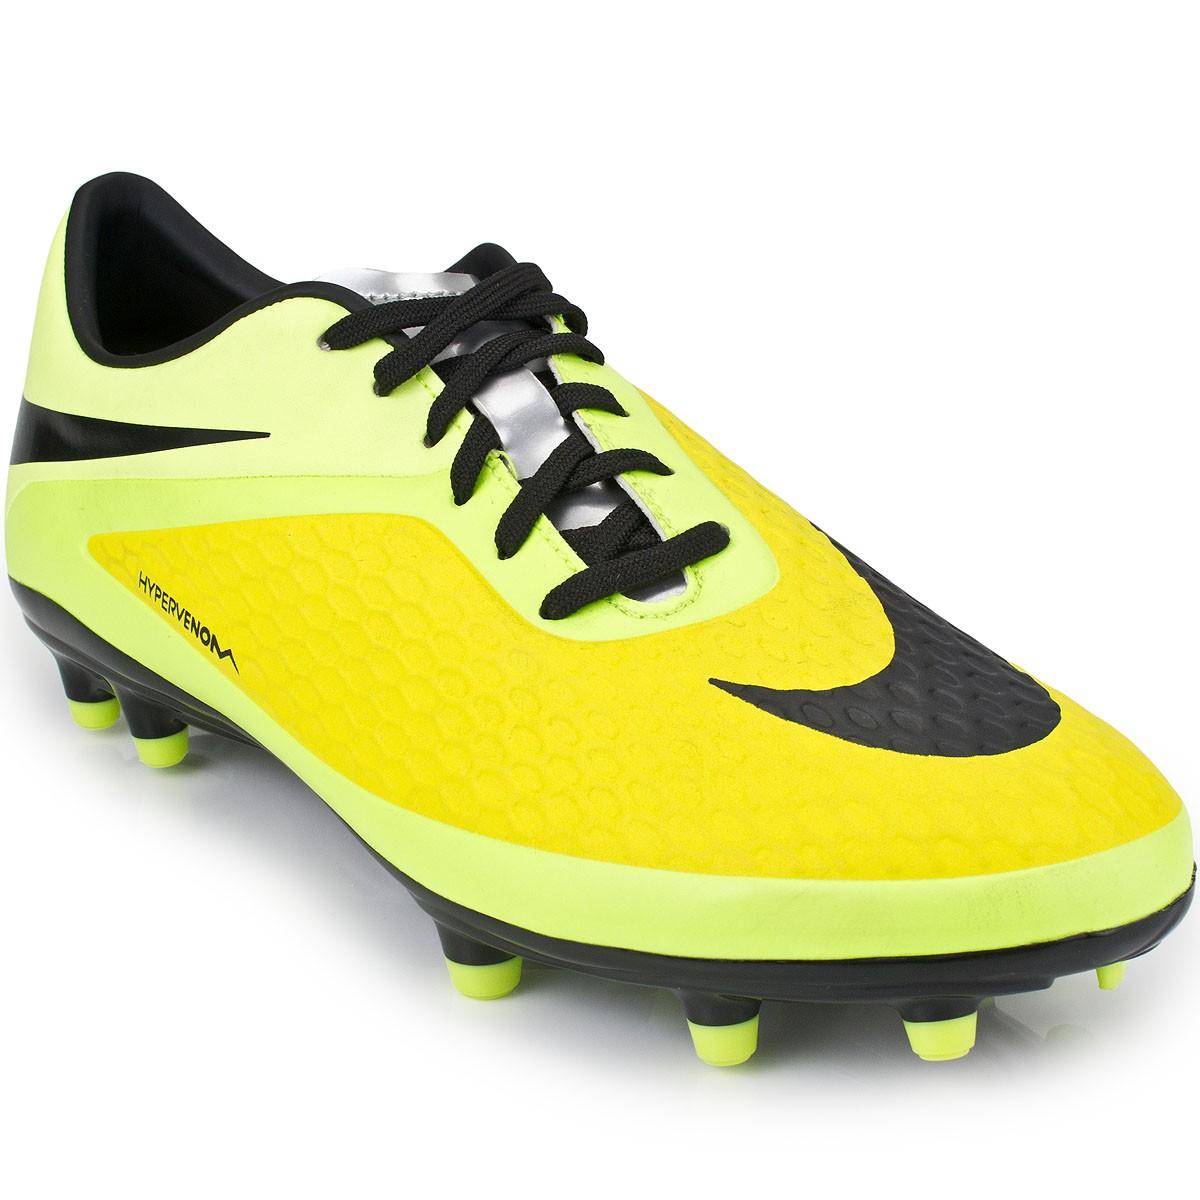 5f0b780f16 Chuteira Nike Hypervenom Phelon FG 599730